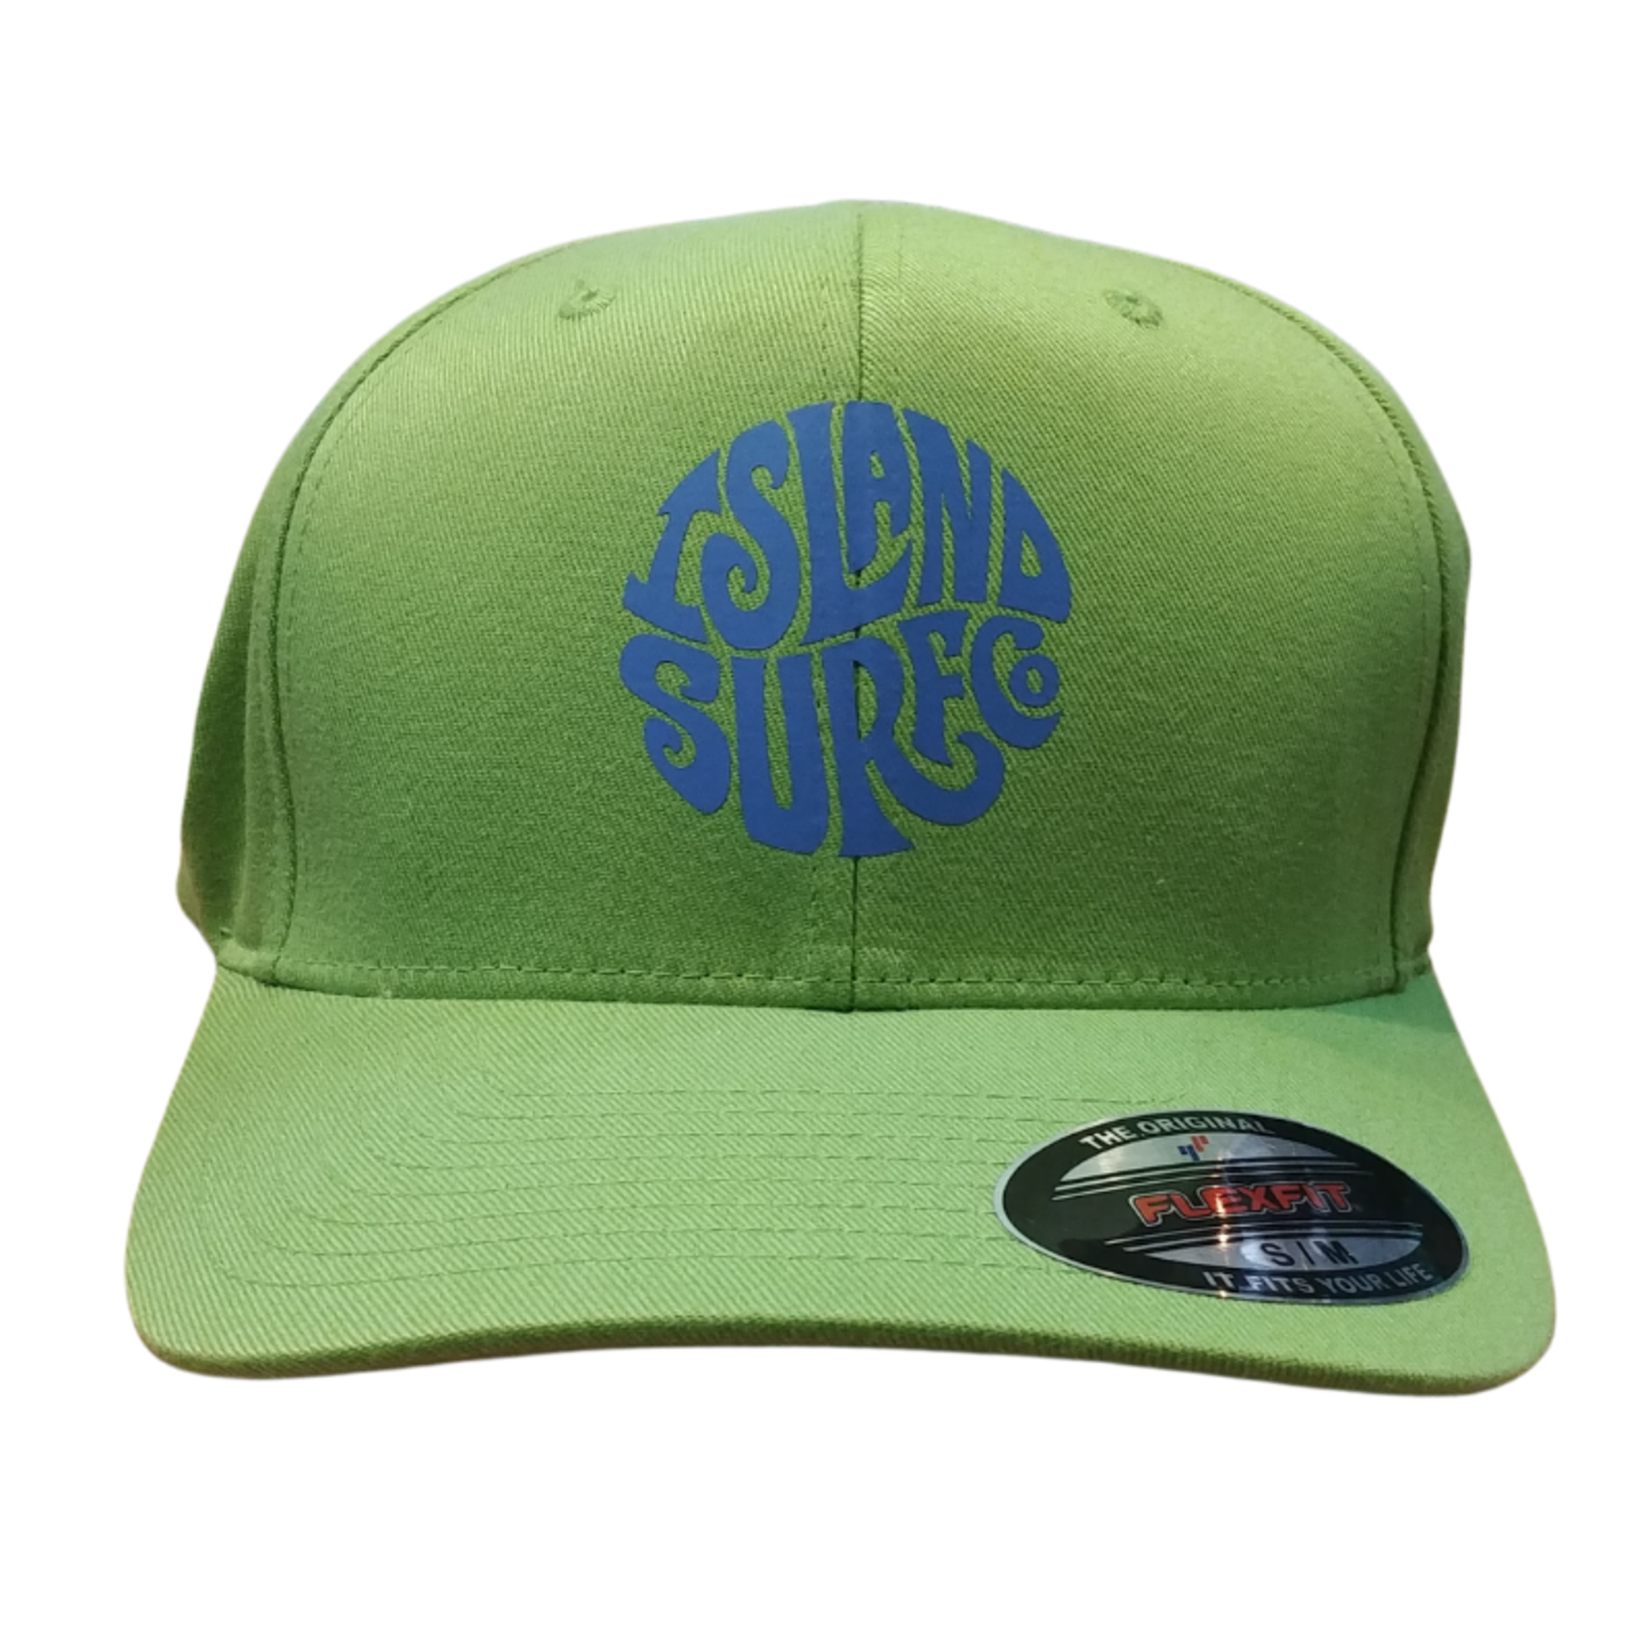 Island Surf Company Island Surf Company Retro Circle Flexfit Original Cap.